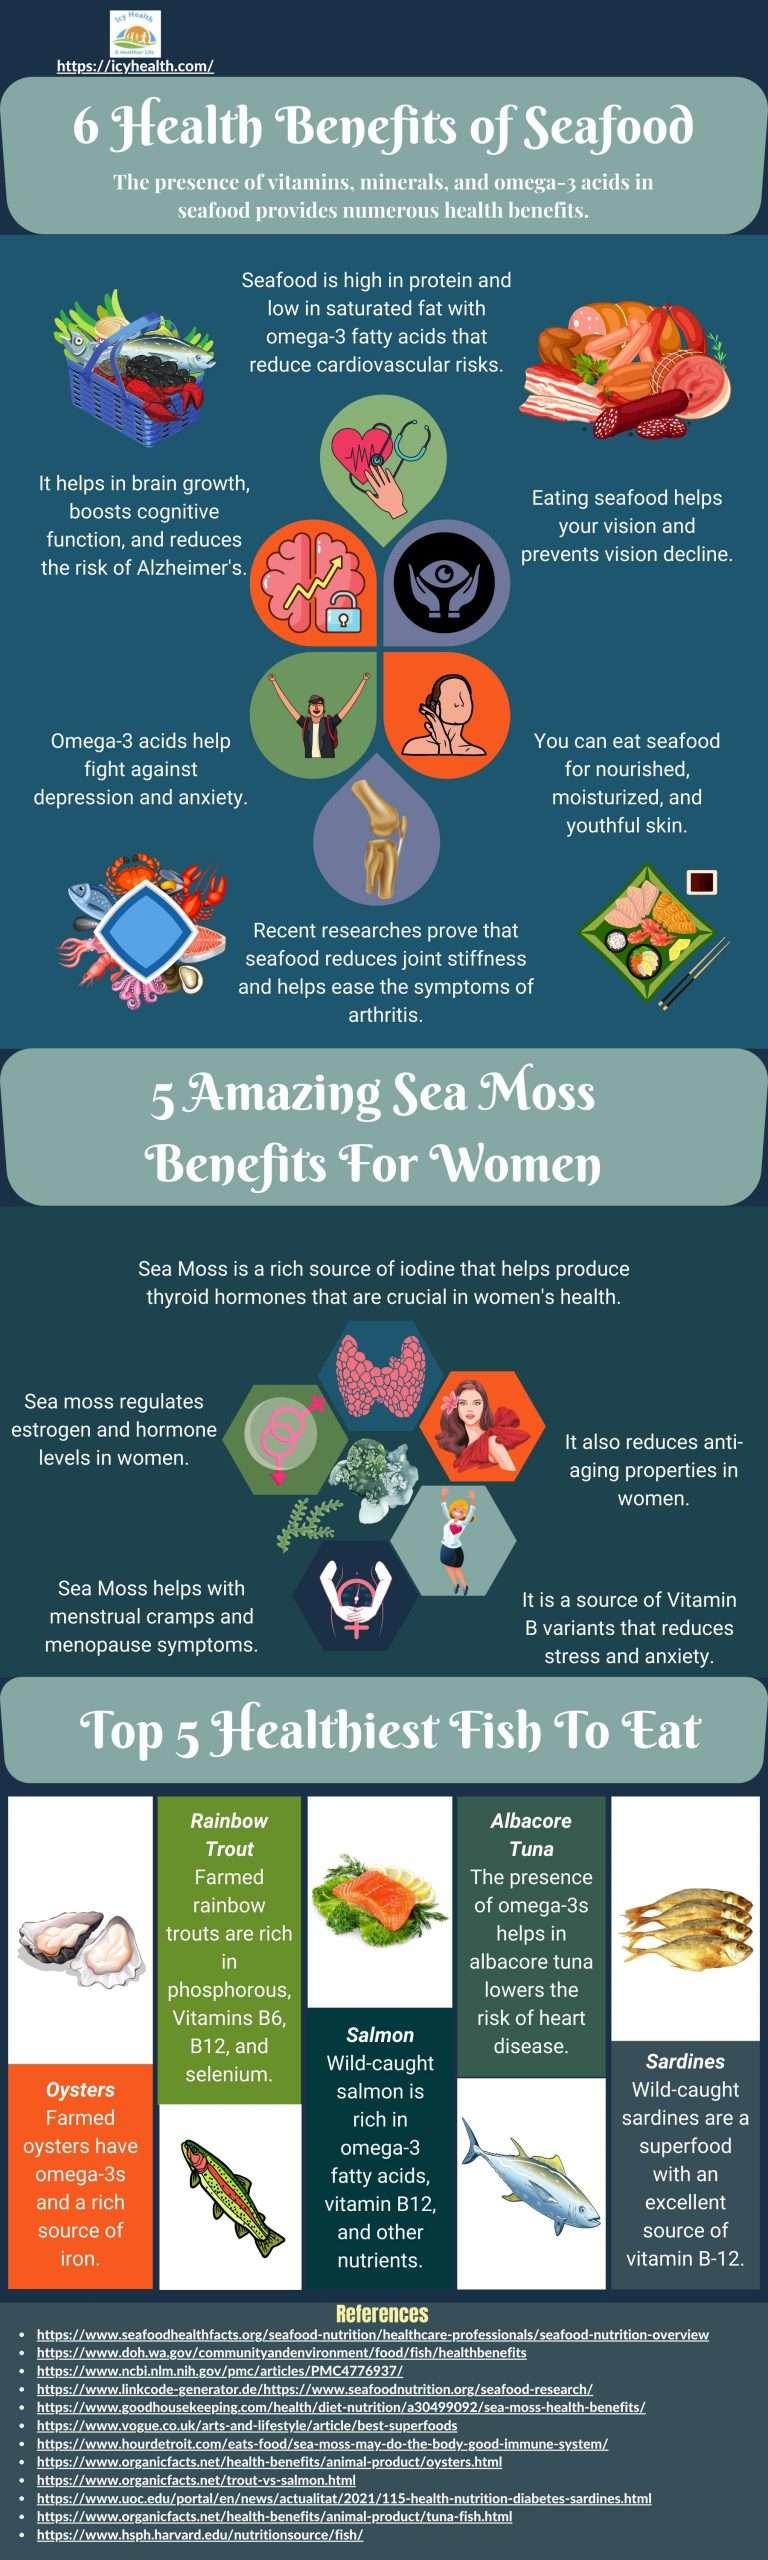 https://icyhealth.com/15-wonderful-sea-moss-benefits-for-men/